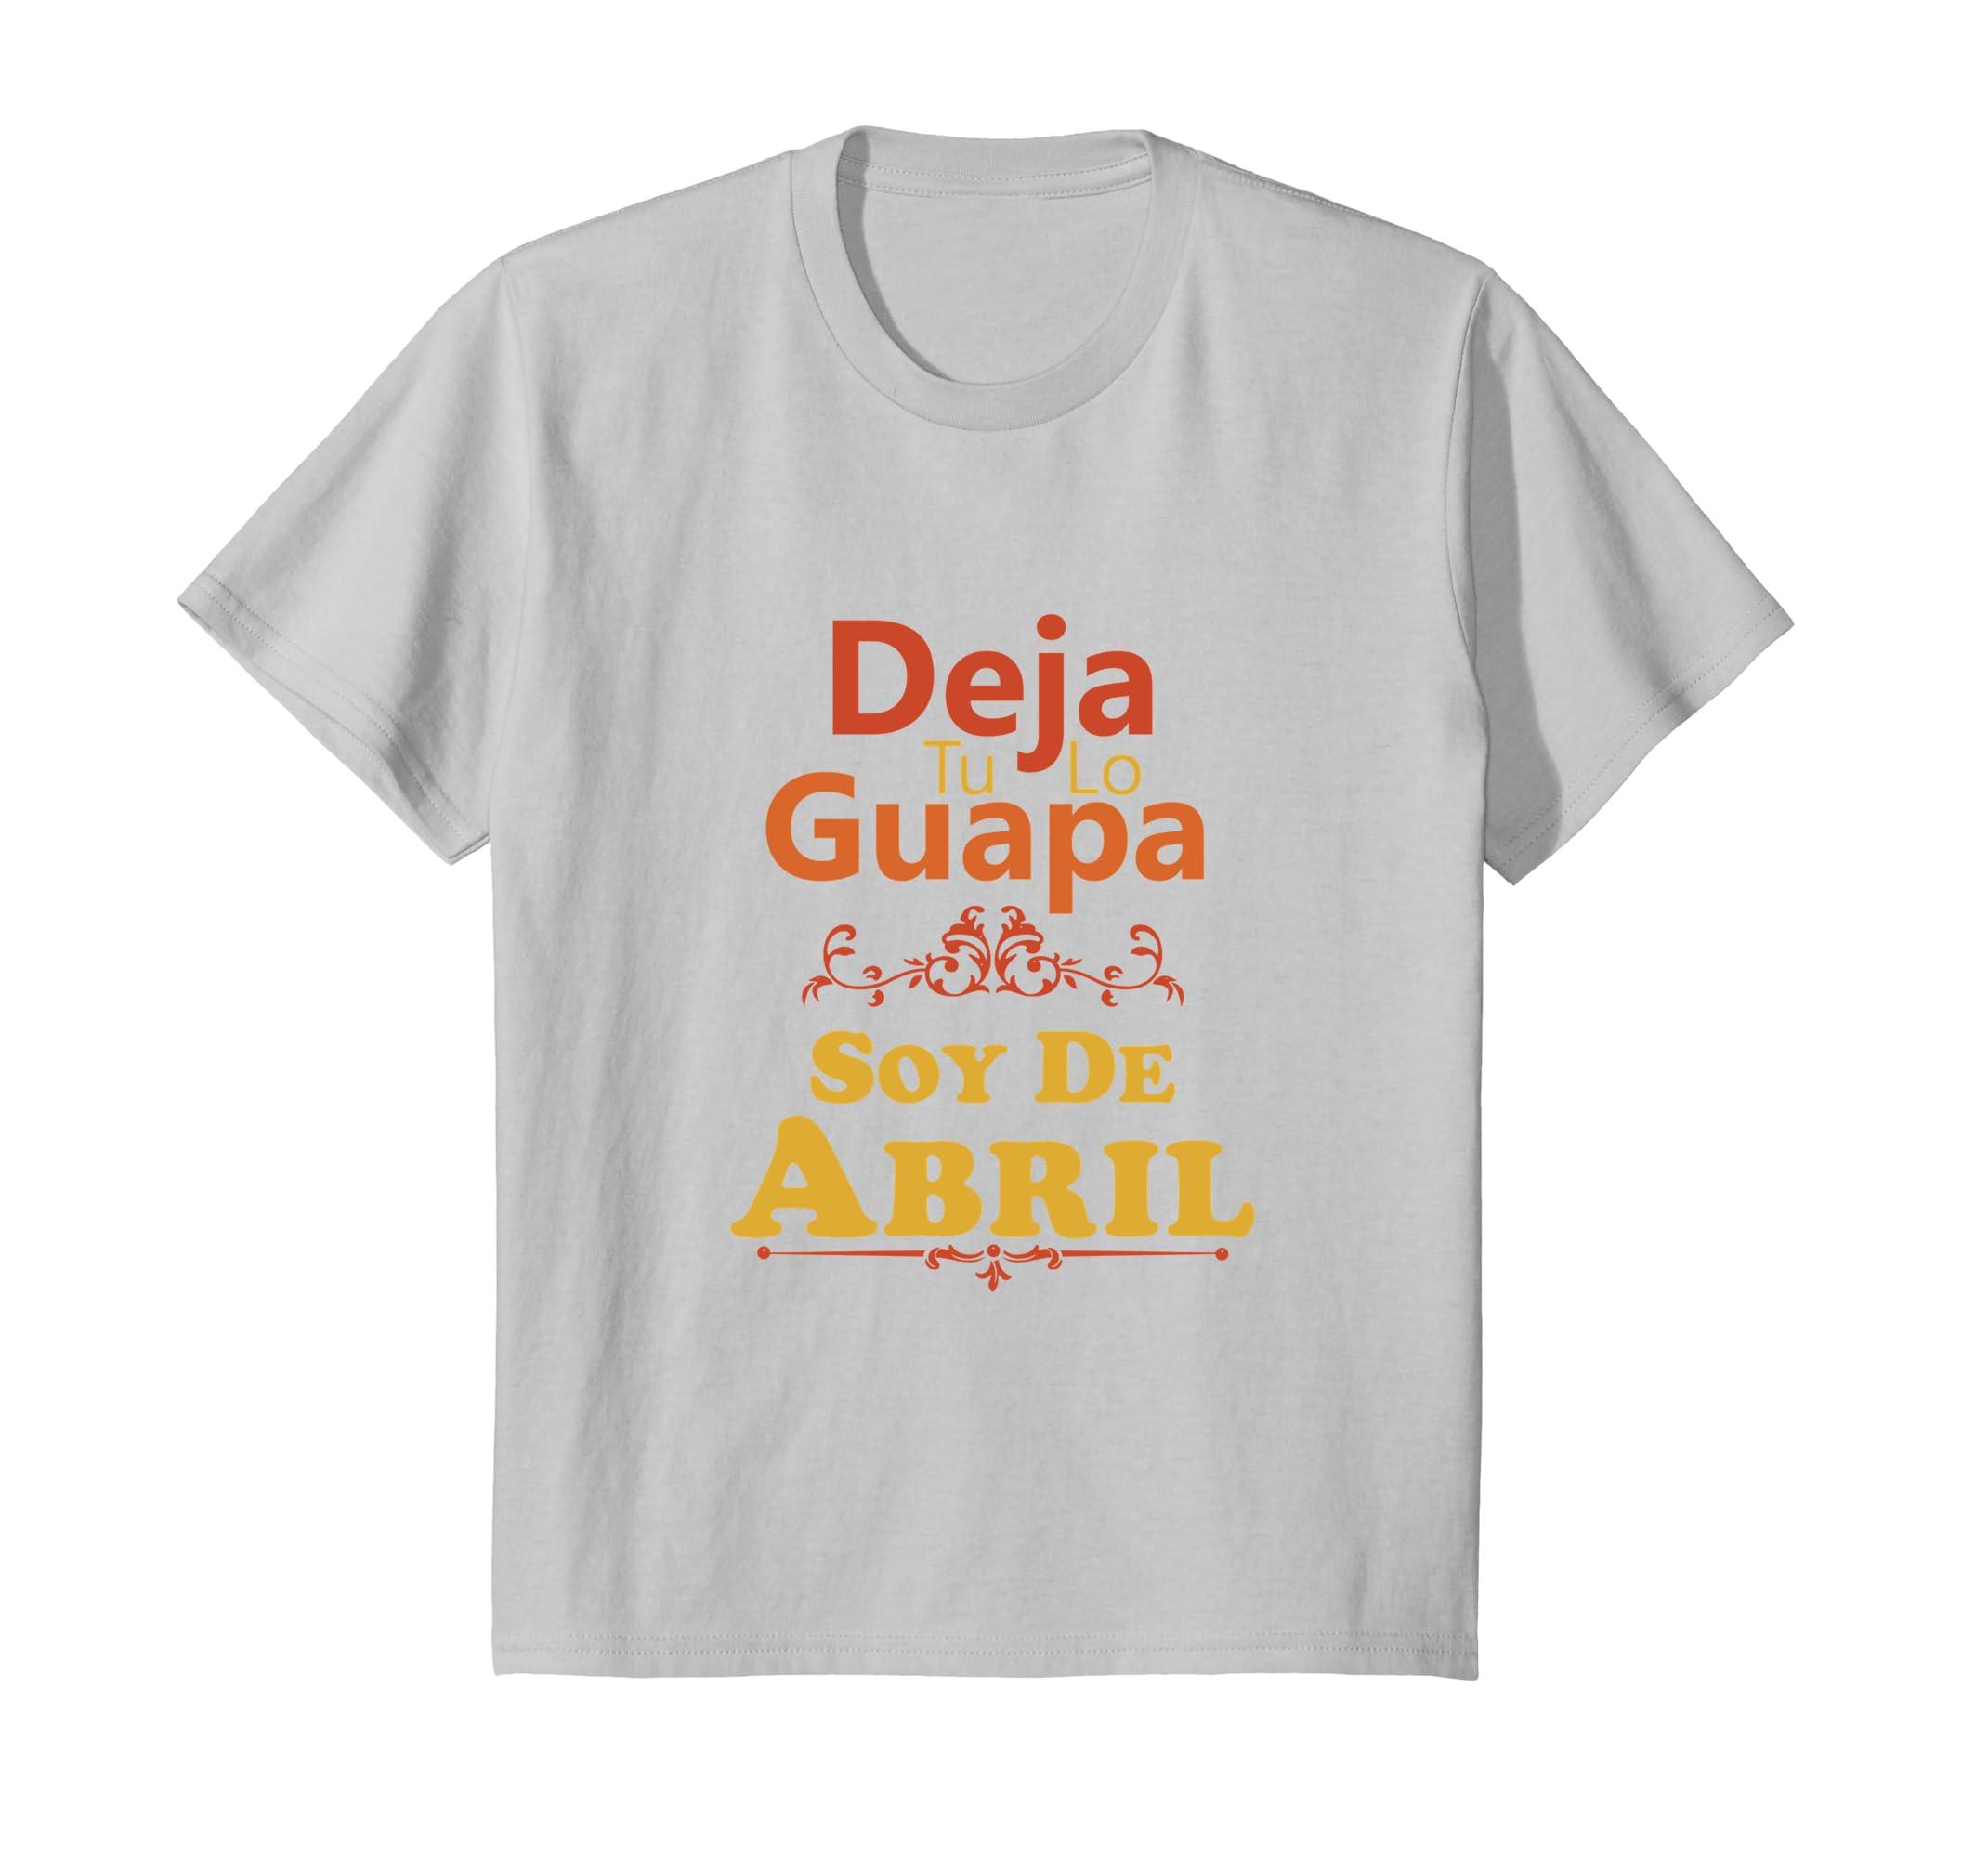 Amazon.com: Camiseta De Mujer Deja Tu Lo Guapa Soy De Abril Spanish Tee: Clothing